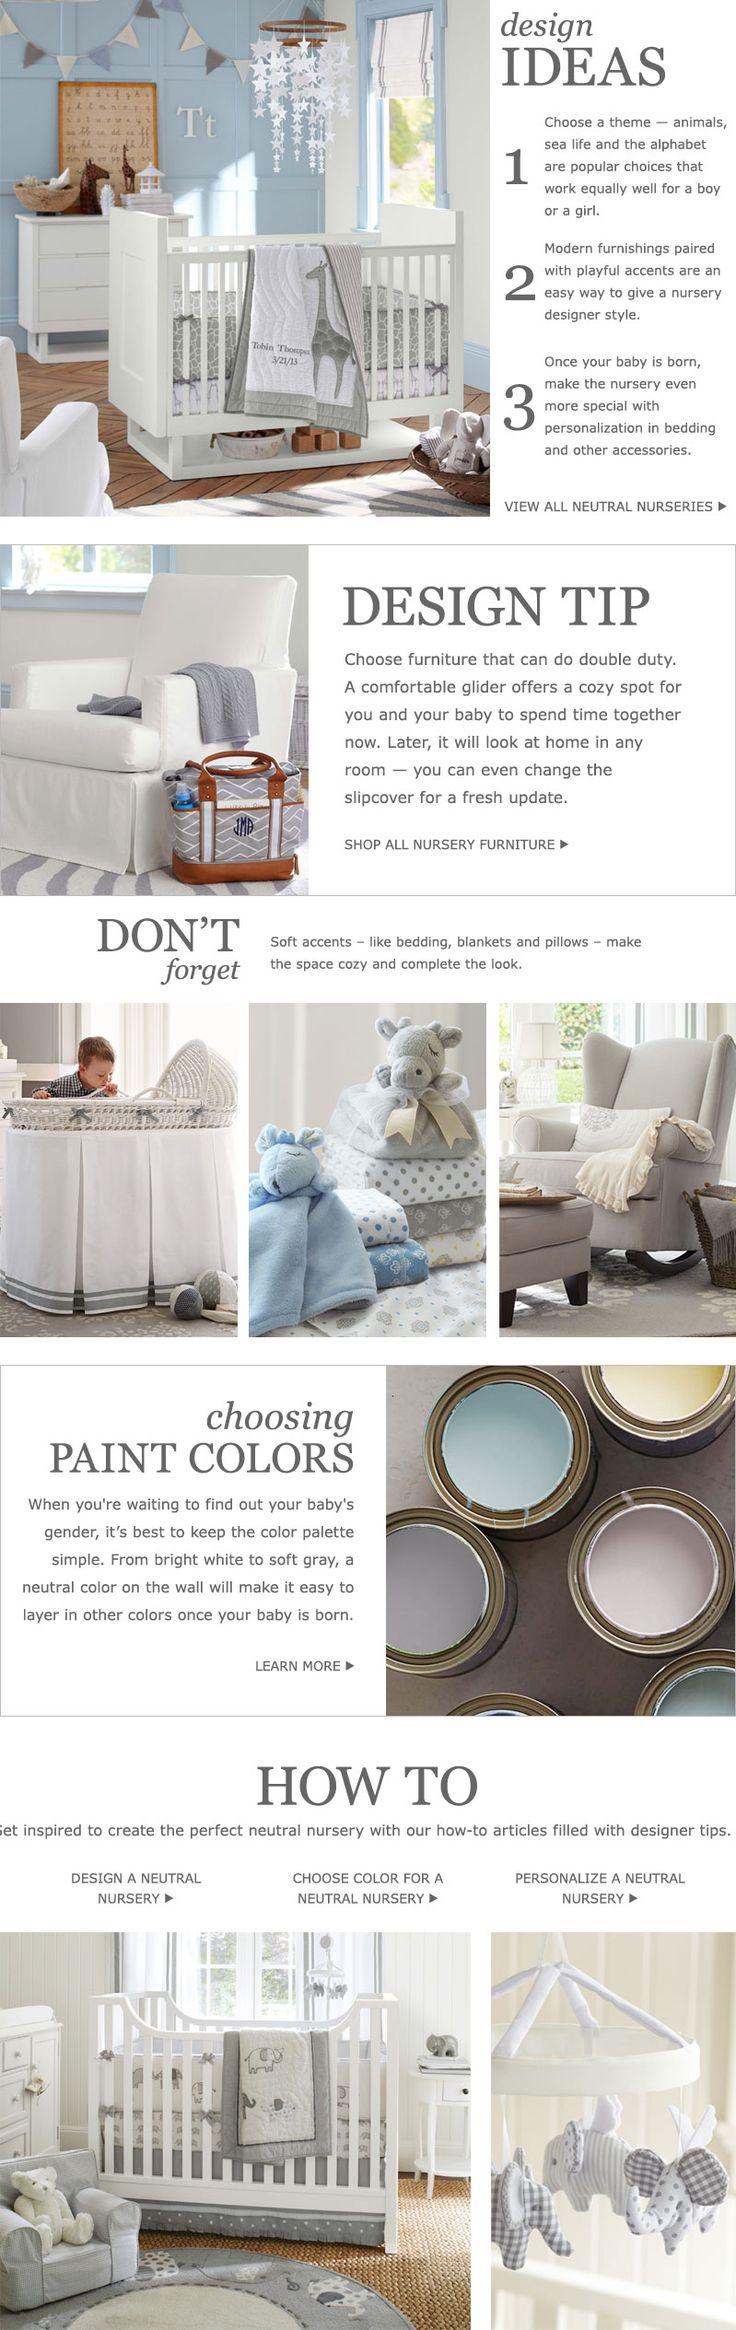 Baby Nursery Themes & Nursery Design | Pottery Barn Kids